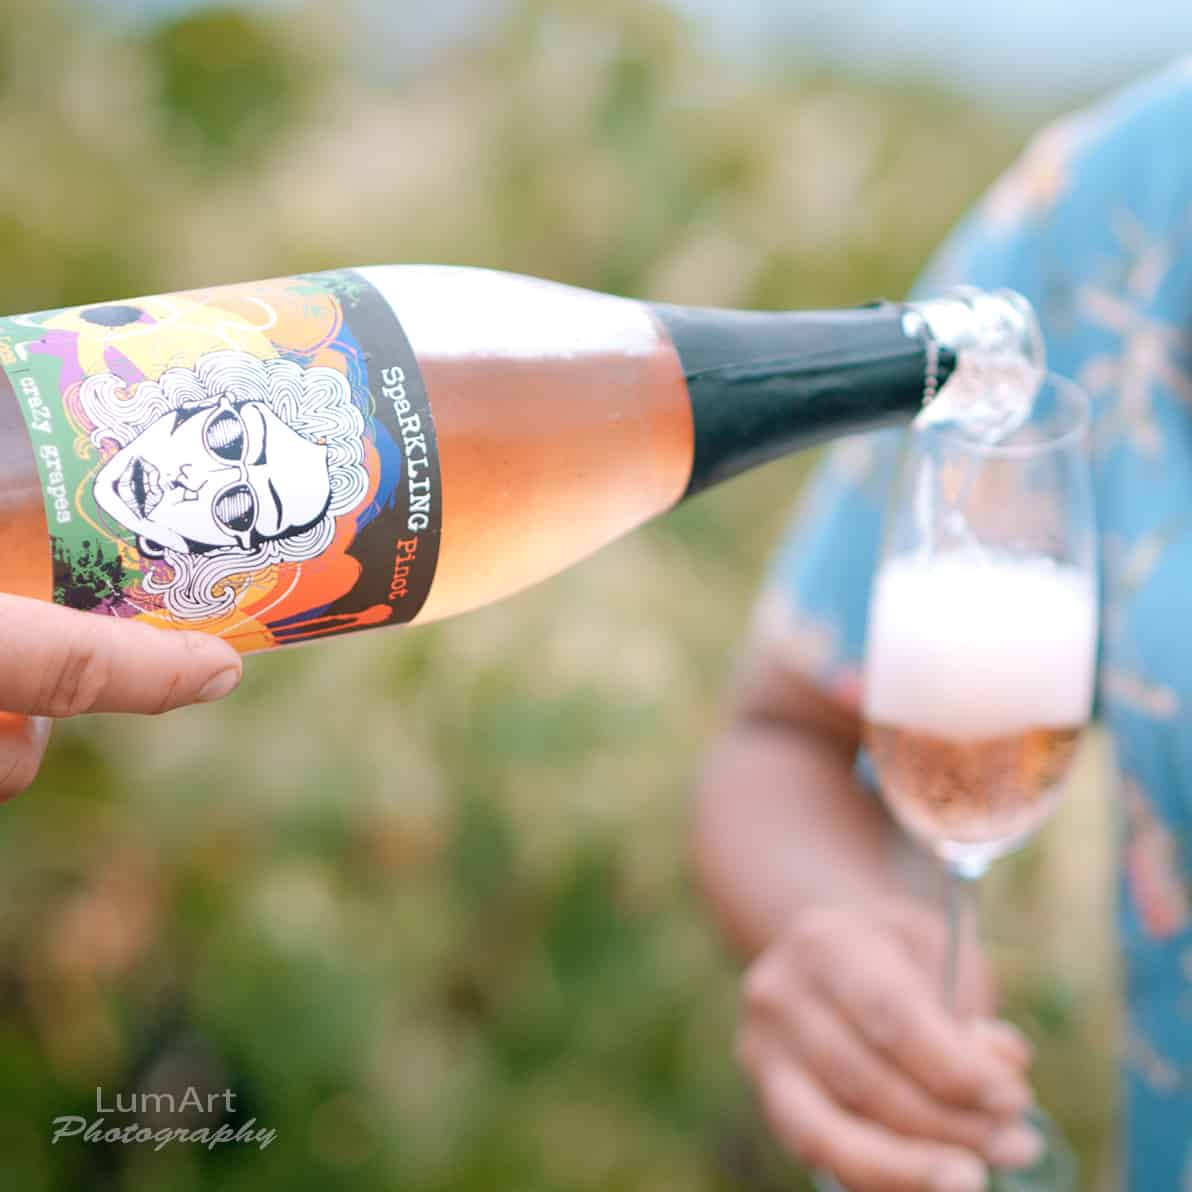 LumArt_Food and Wine_14_Delluva_Sparkling_Lifestyle